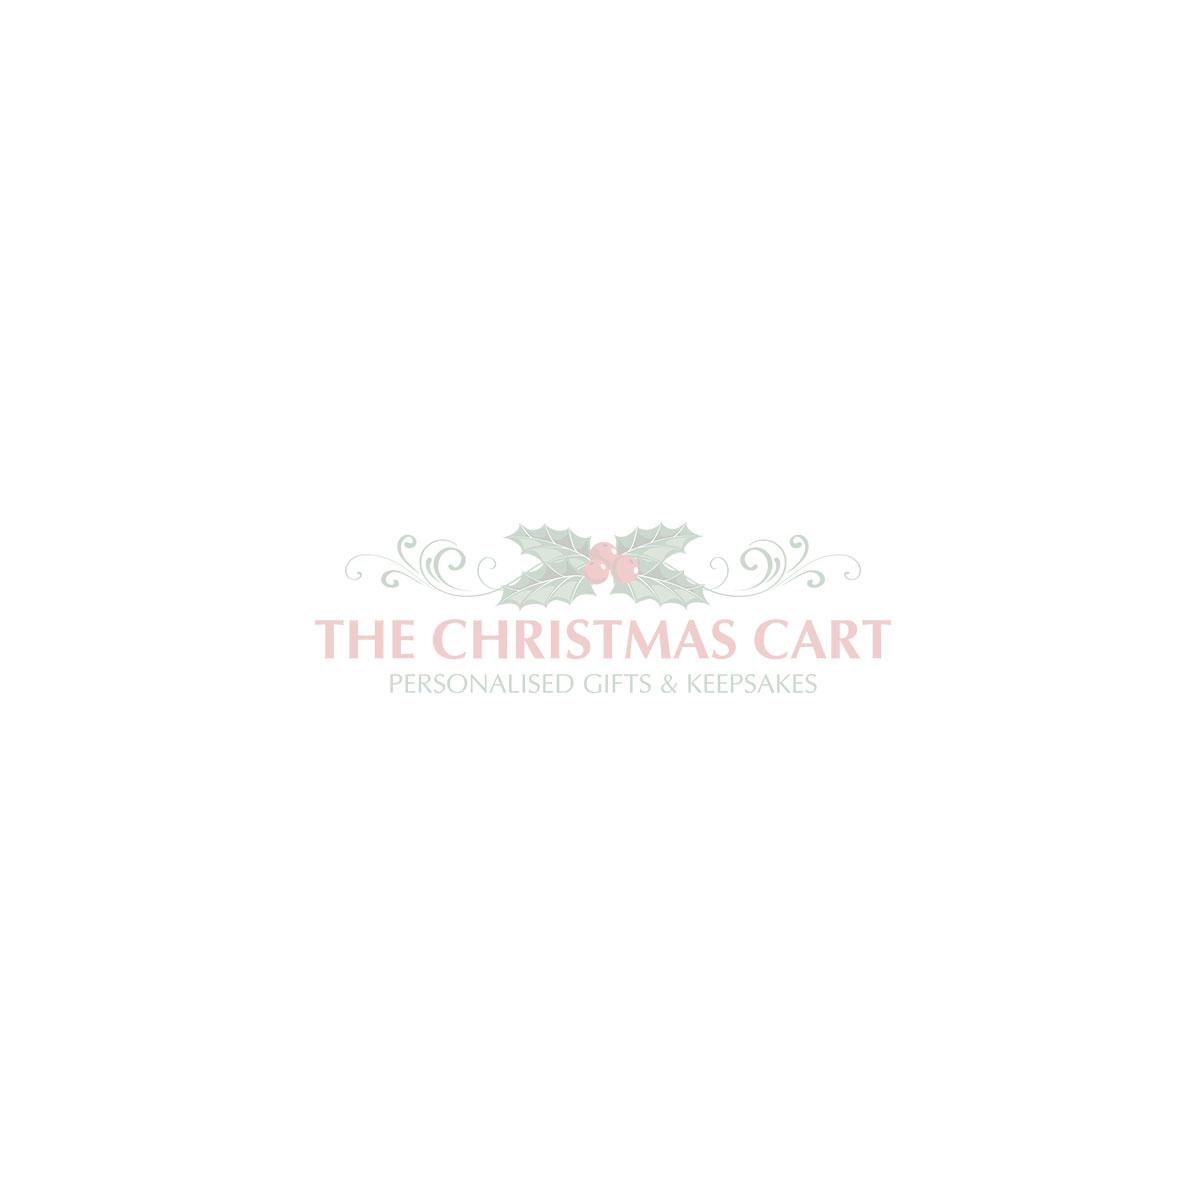 Natural Wood Santa Please Stop Here Arrow Sign - White Reindeer